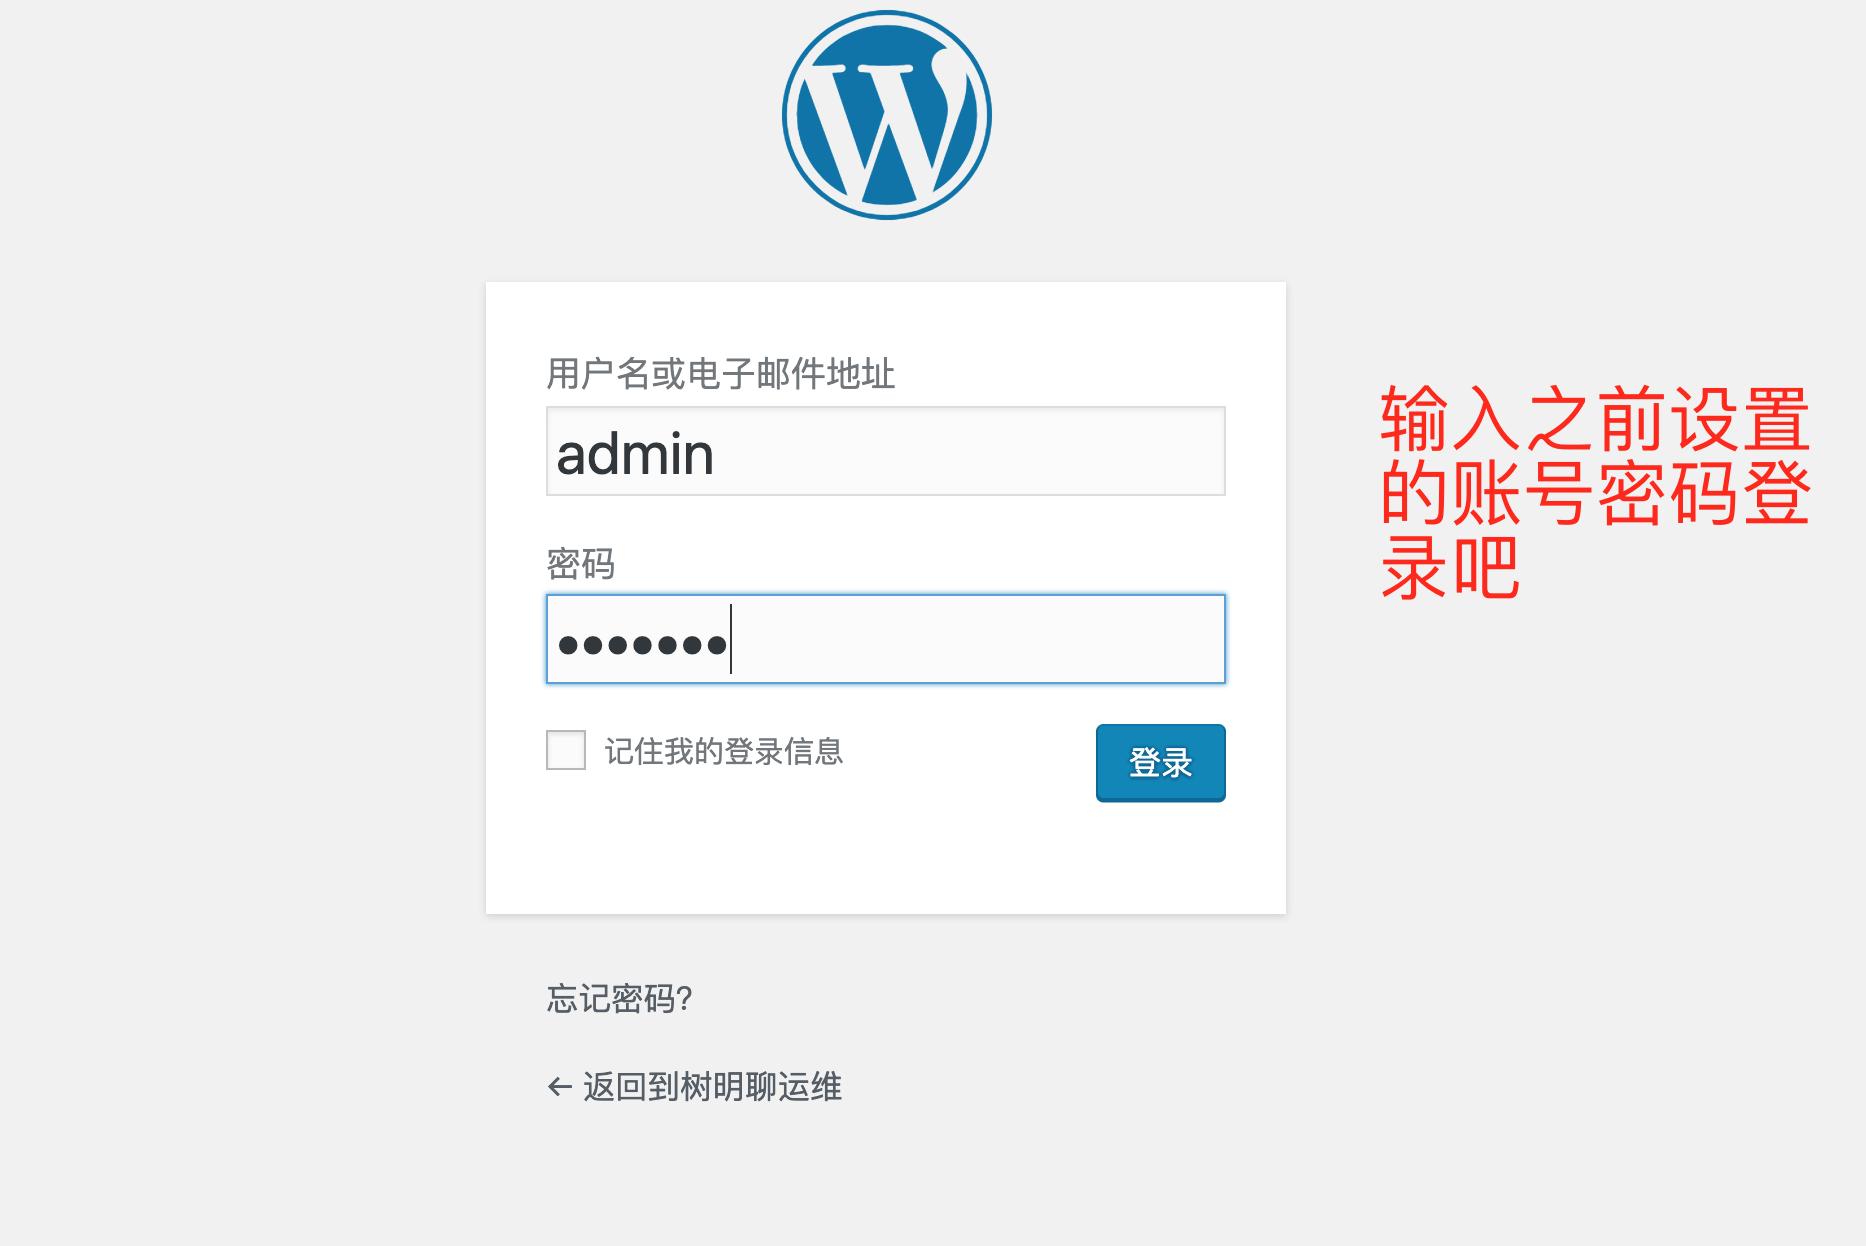 wordpress_install_08.png